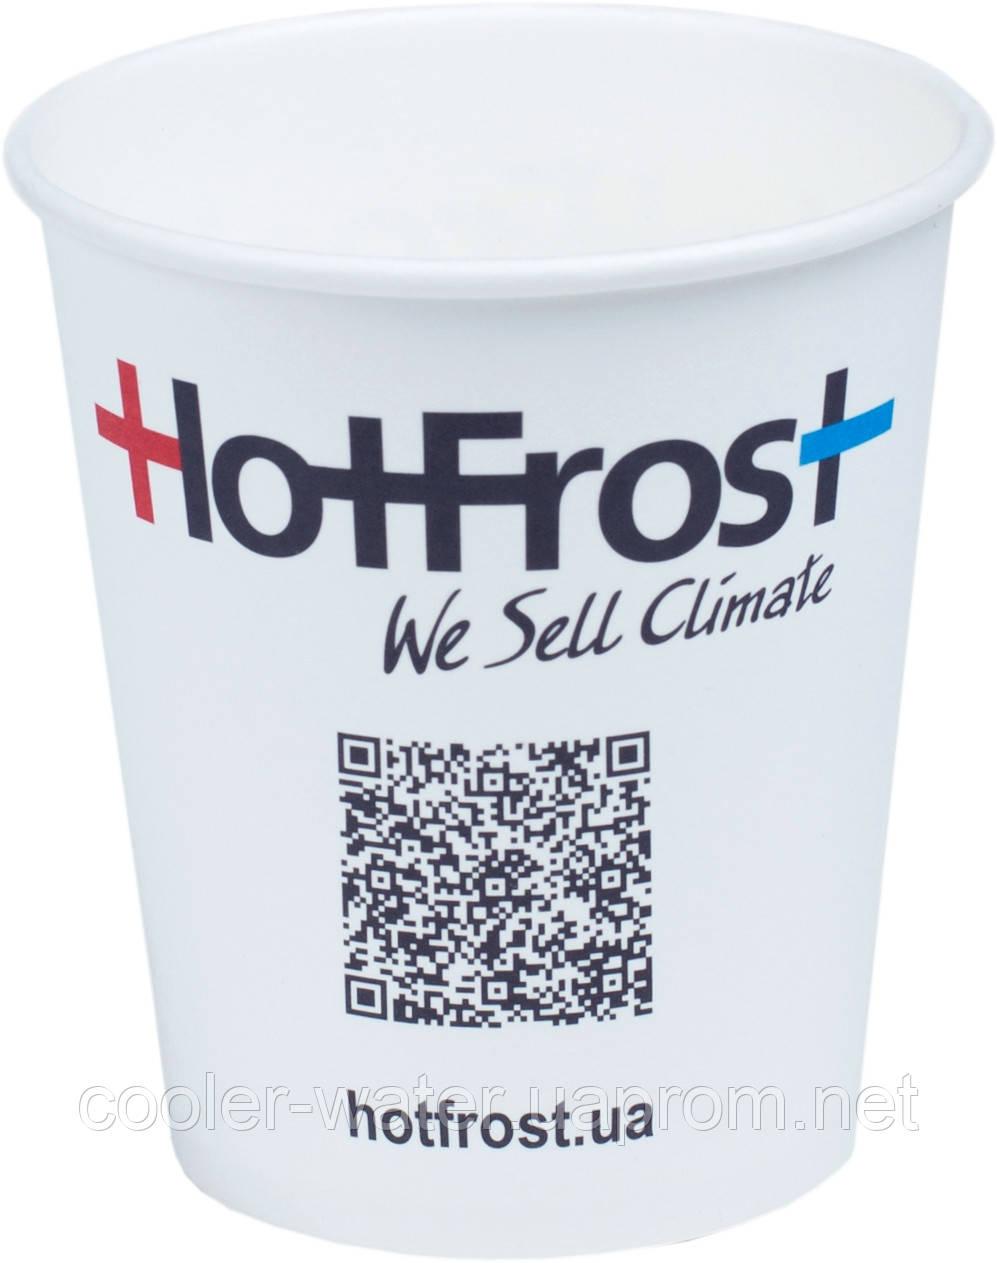 Стаканчики паперові HotFrost 255 мл 50 шт